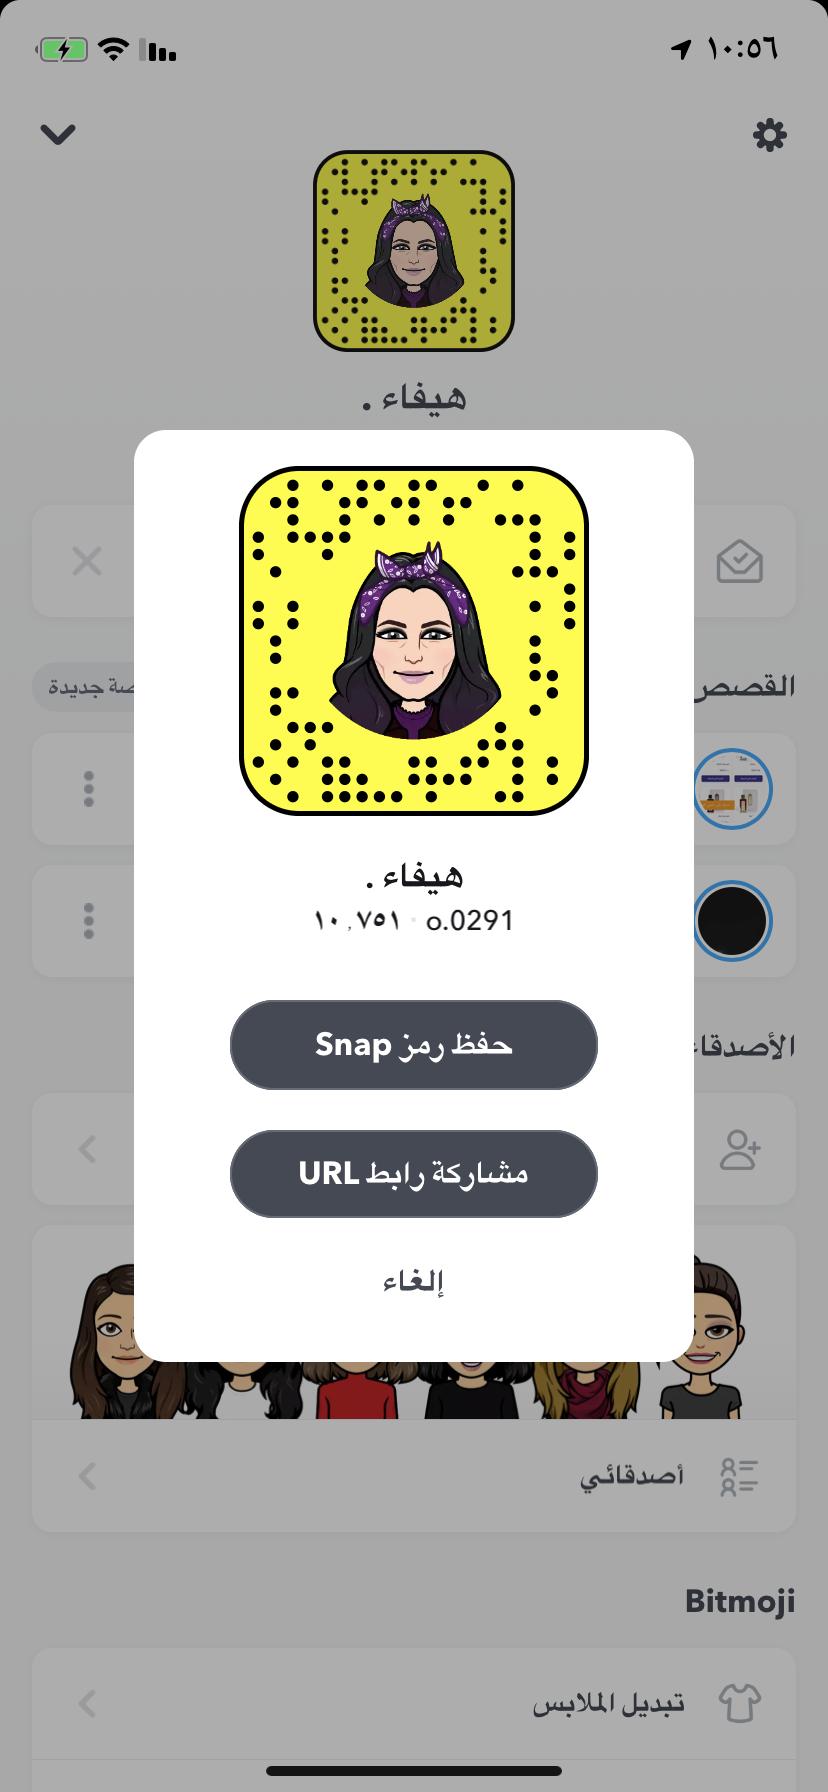 Pin By Hlm On طبيعة Snapchat Screenshot Snapchat Fle